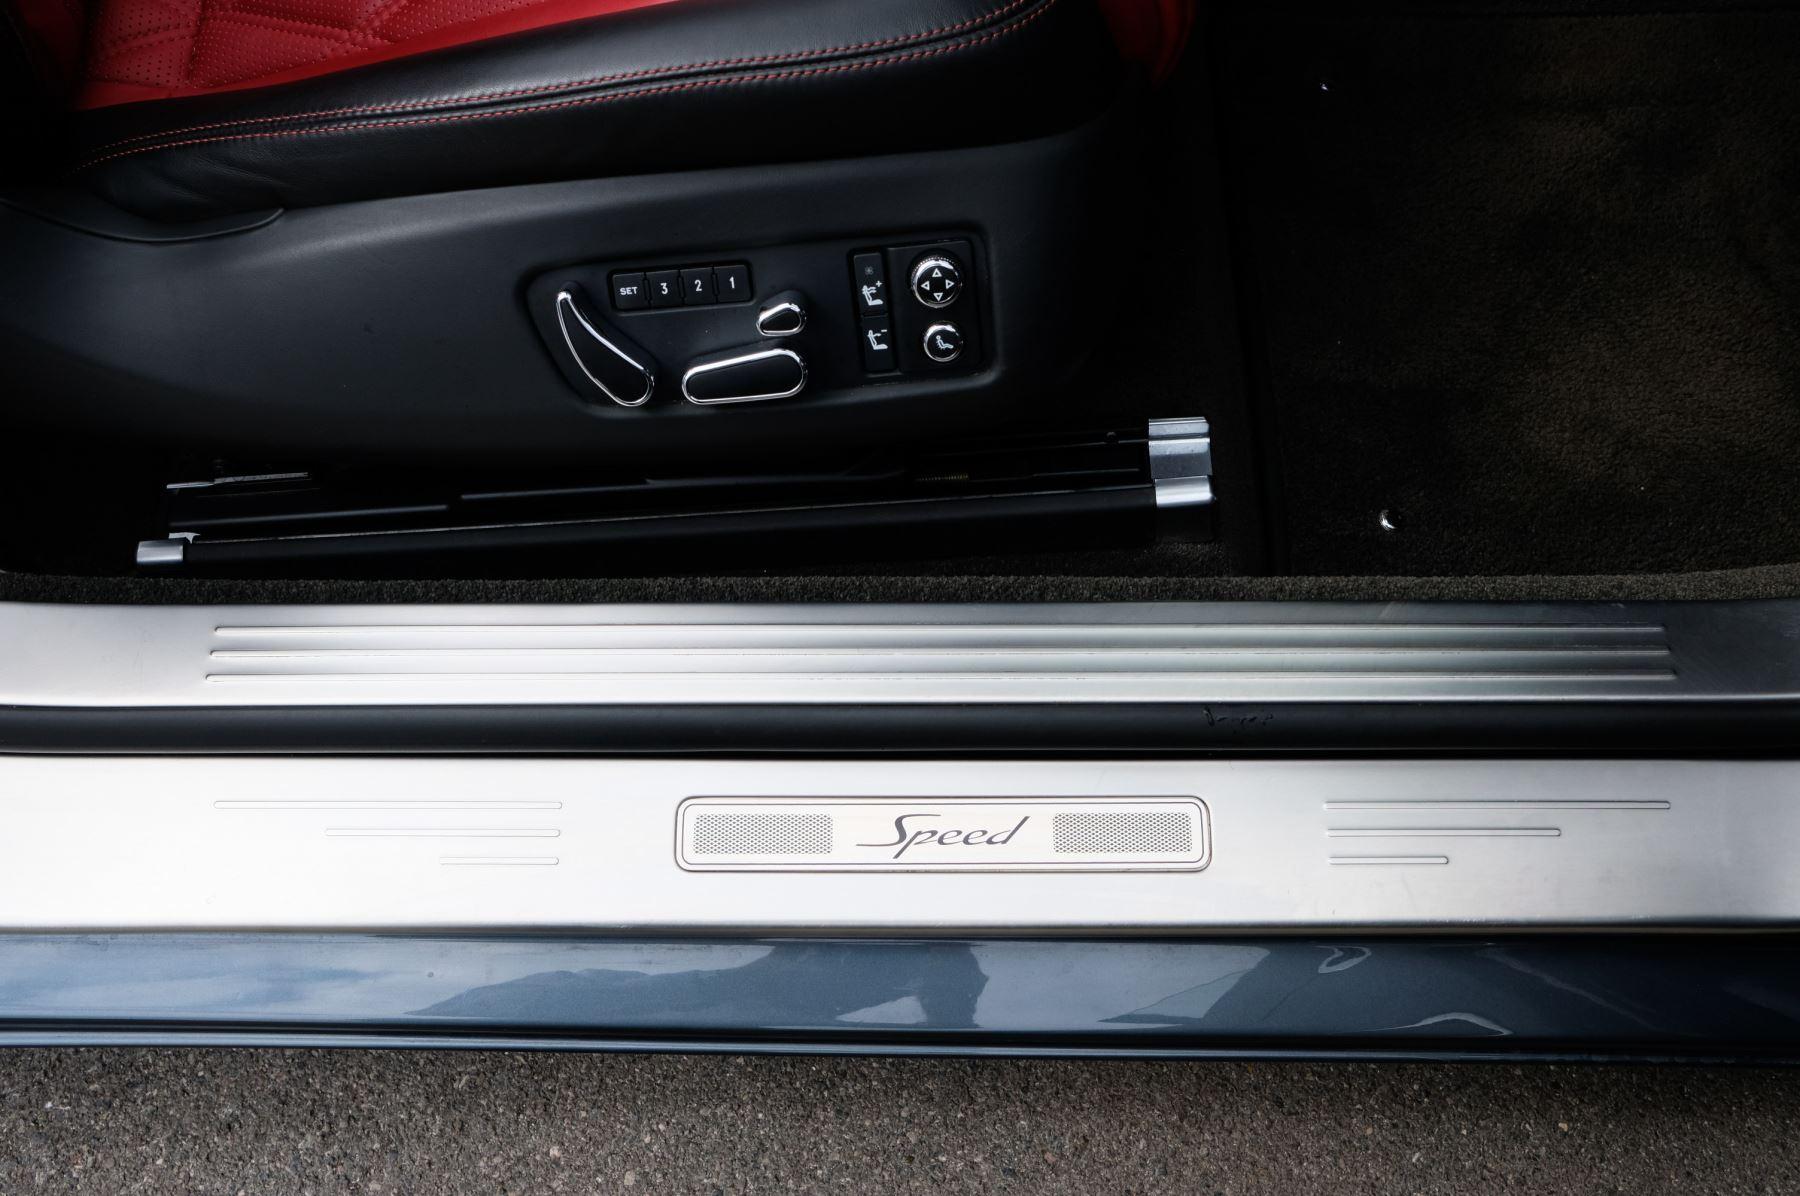 Bentley Continental GTC 6.0 W12 Speed - Massage Seats & Ventilation - Neck Warmer - Rear View Camera image 15